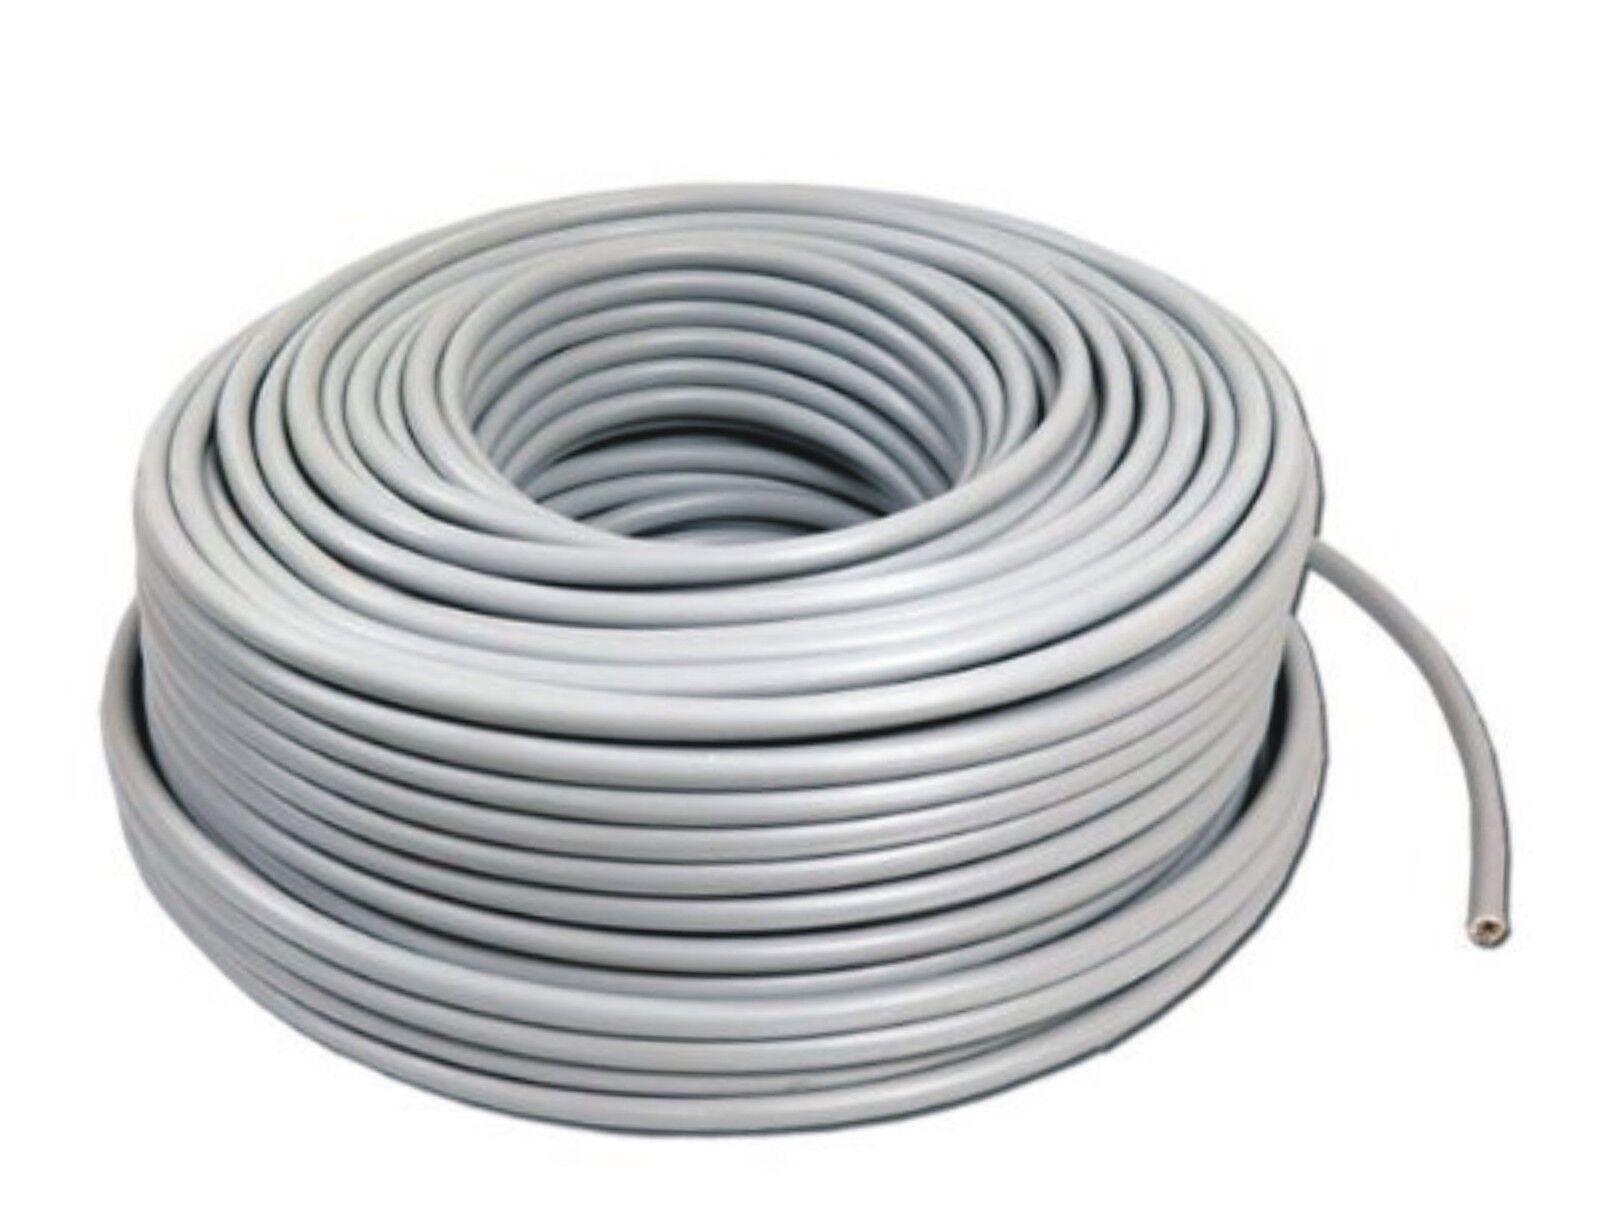 /m) 50m NYM-J 5x1,5mm Stromkabel Mantelleitung Kabel Leitung Elektroleitung